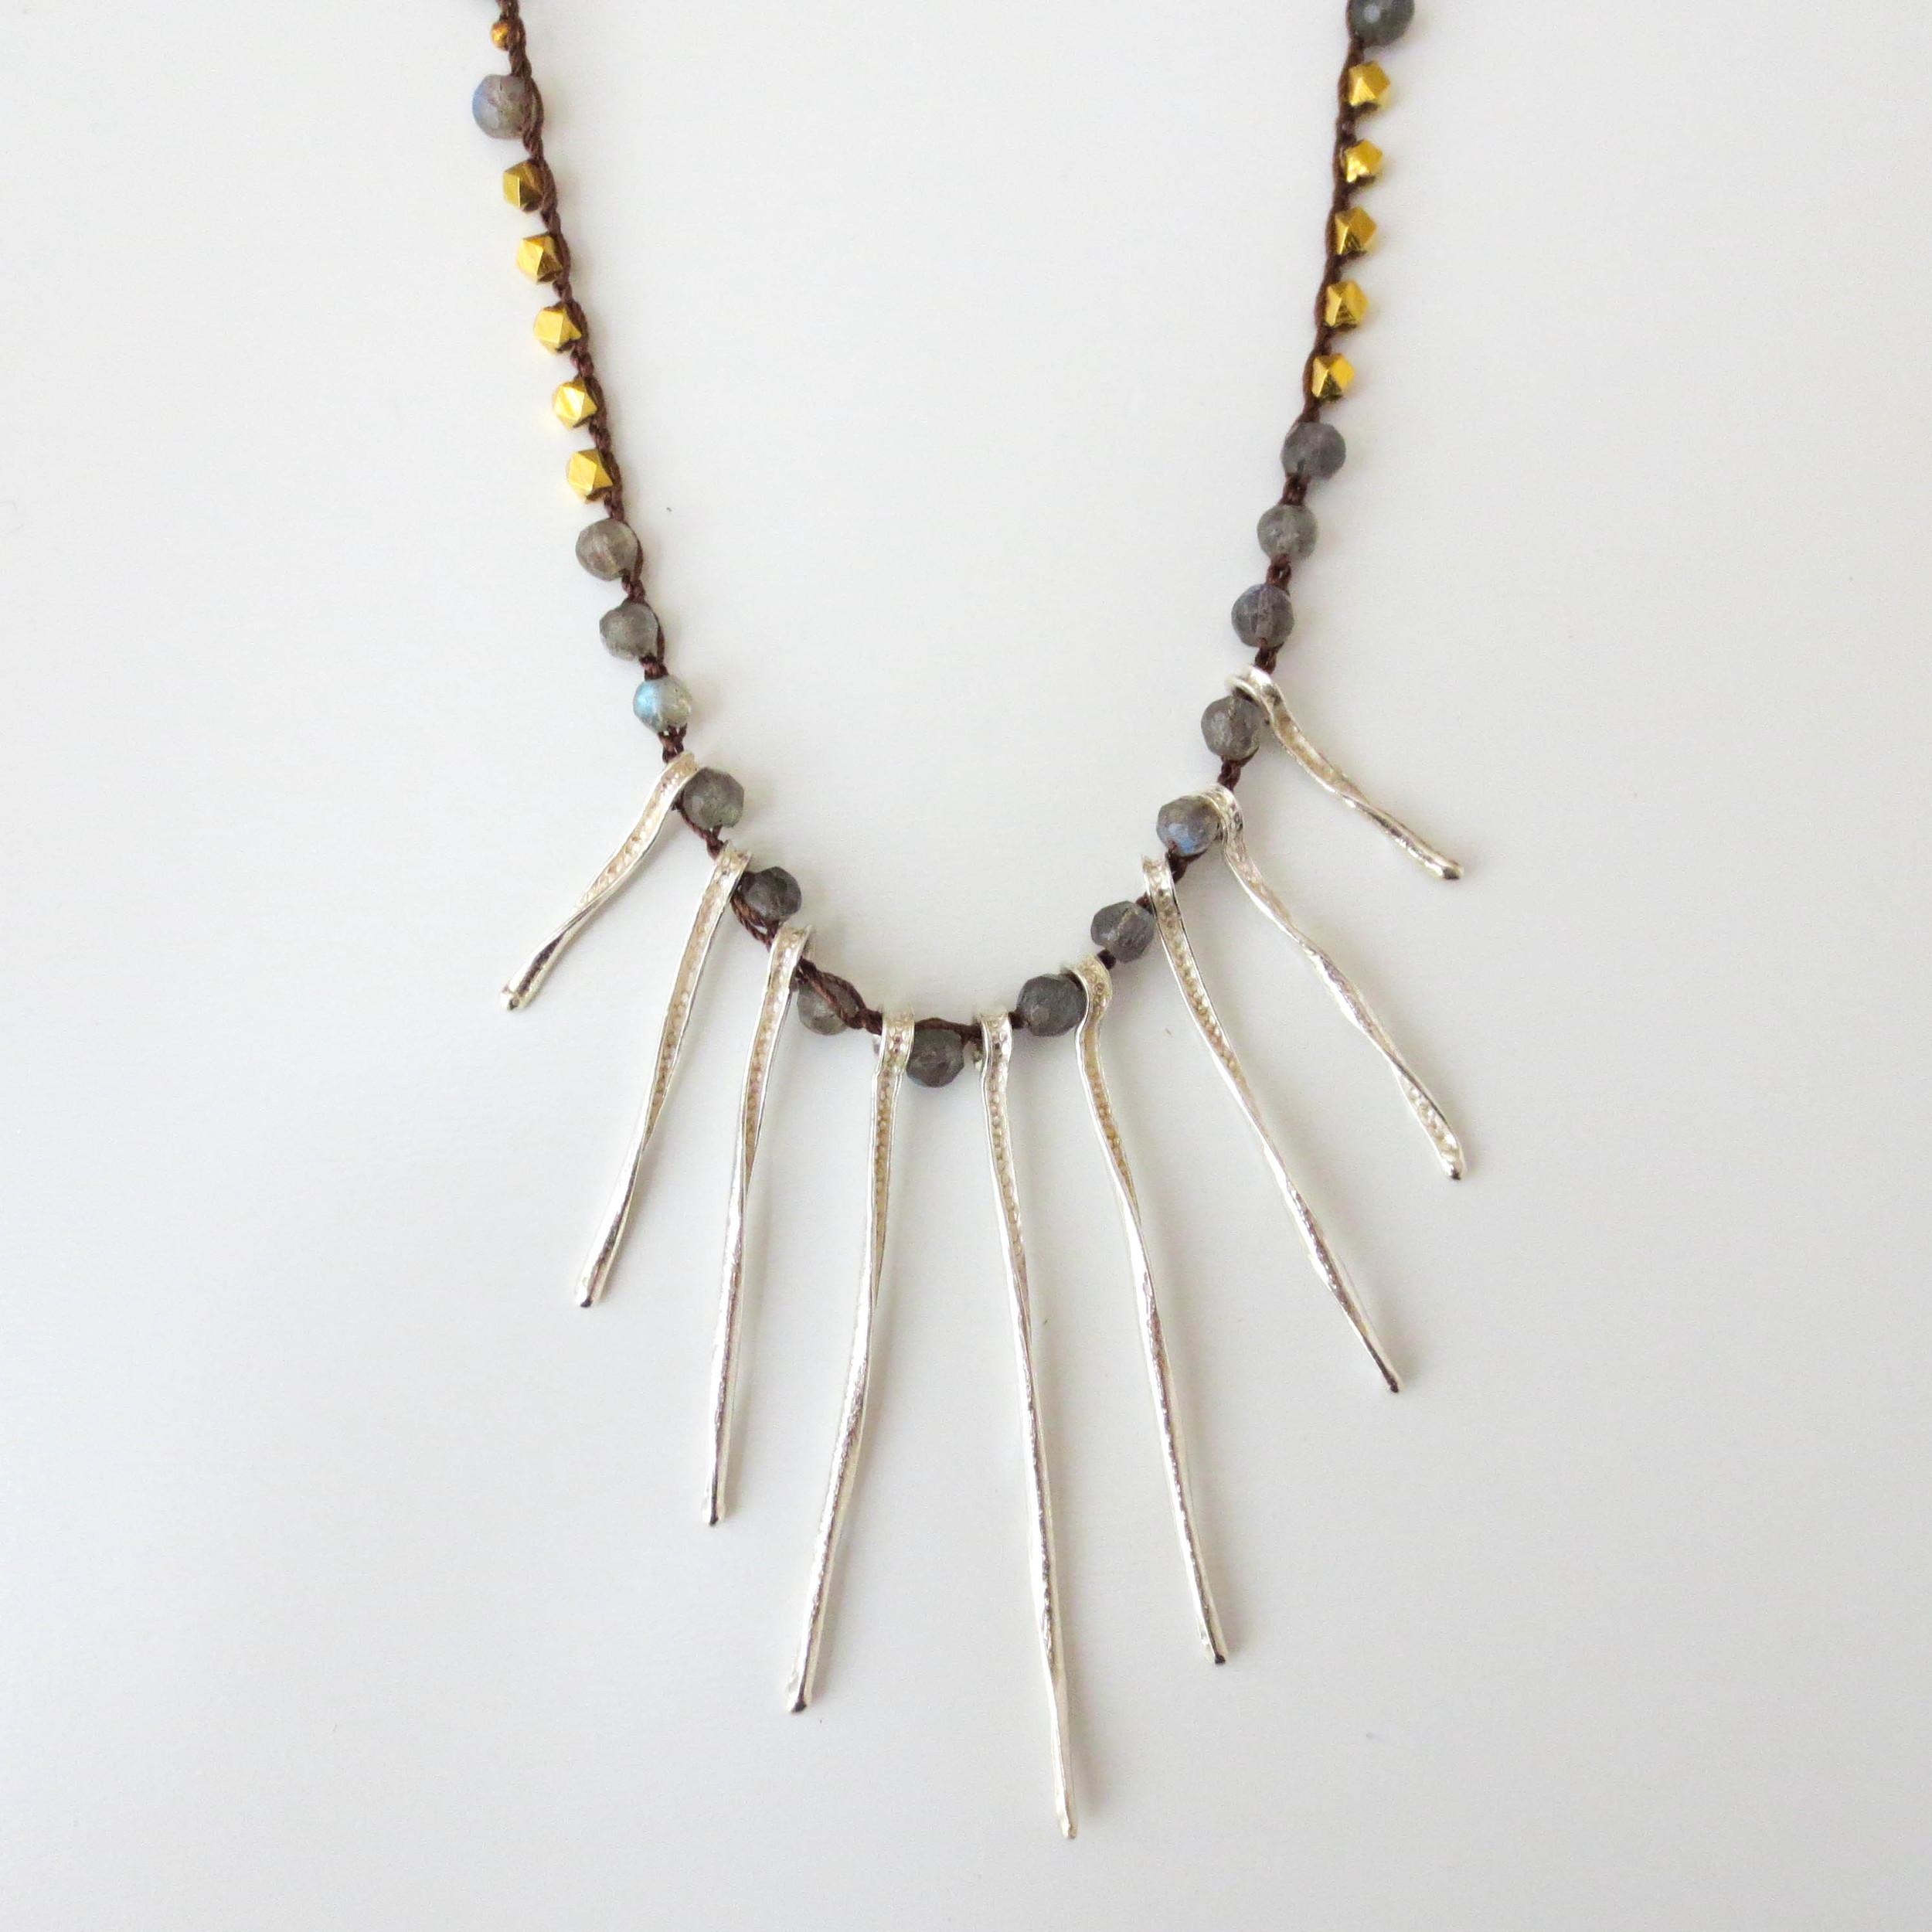 shawn-payne-necklace.jpg